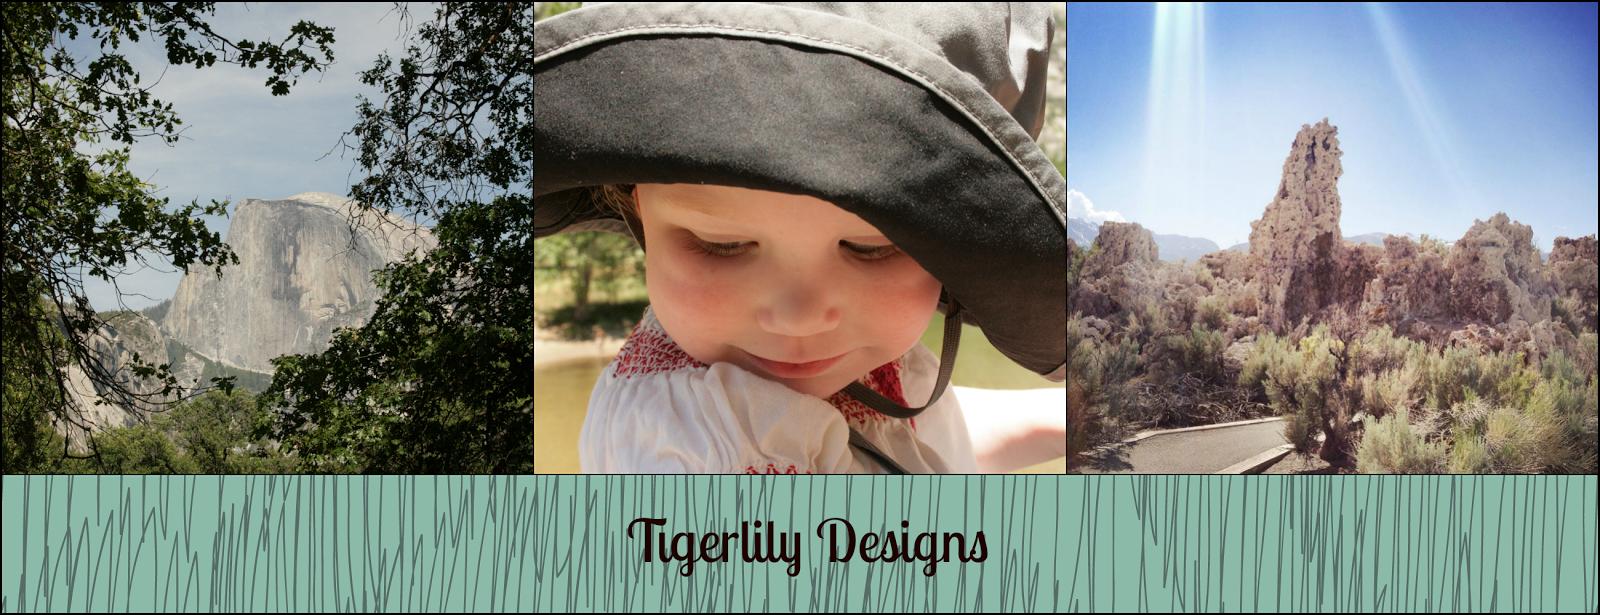 Tiger Lily Designs